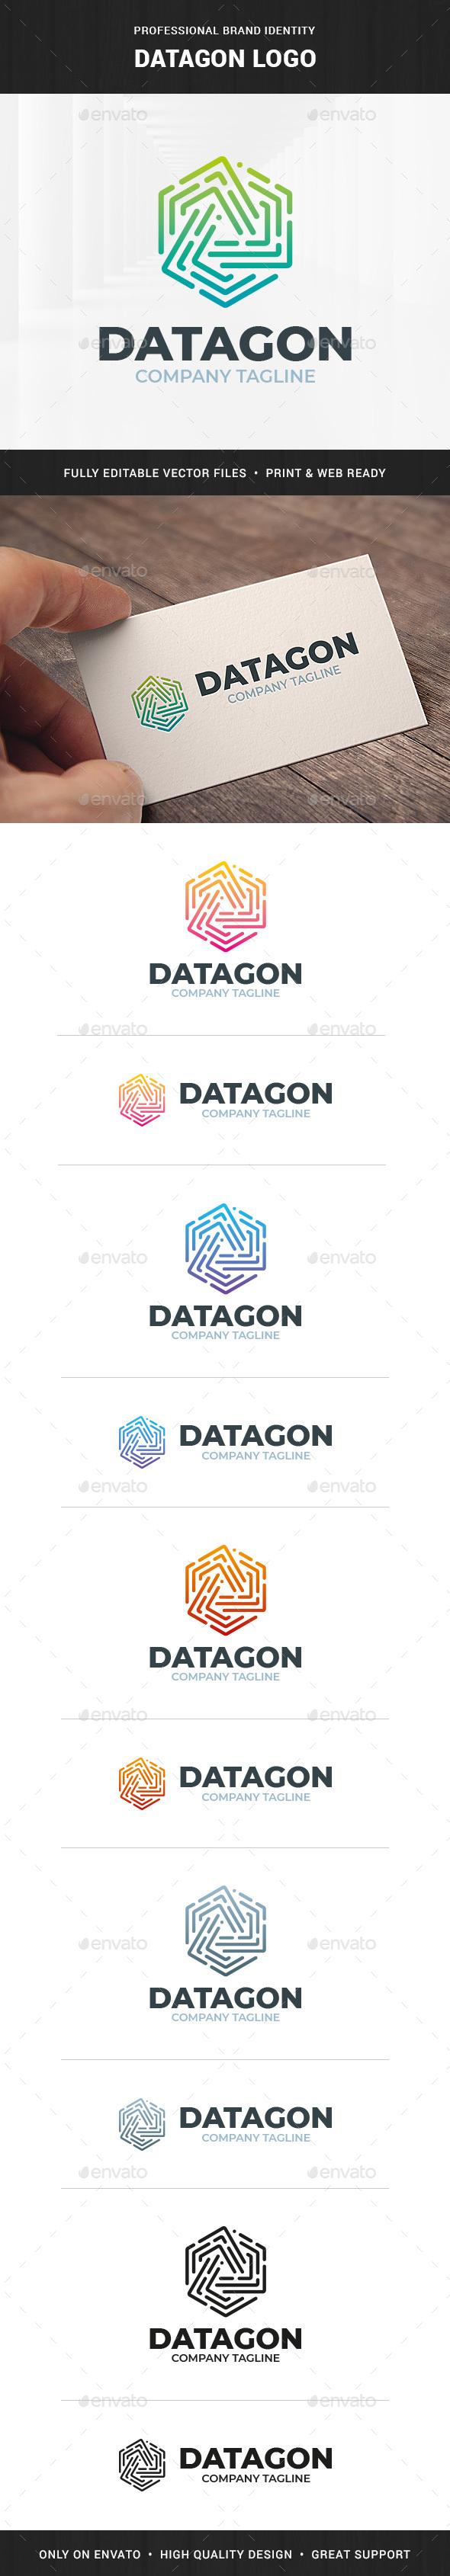 Datagon Logo Template